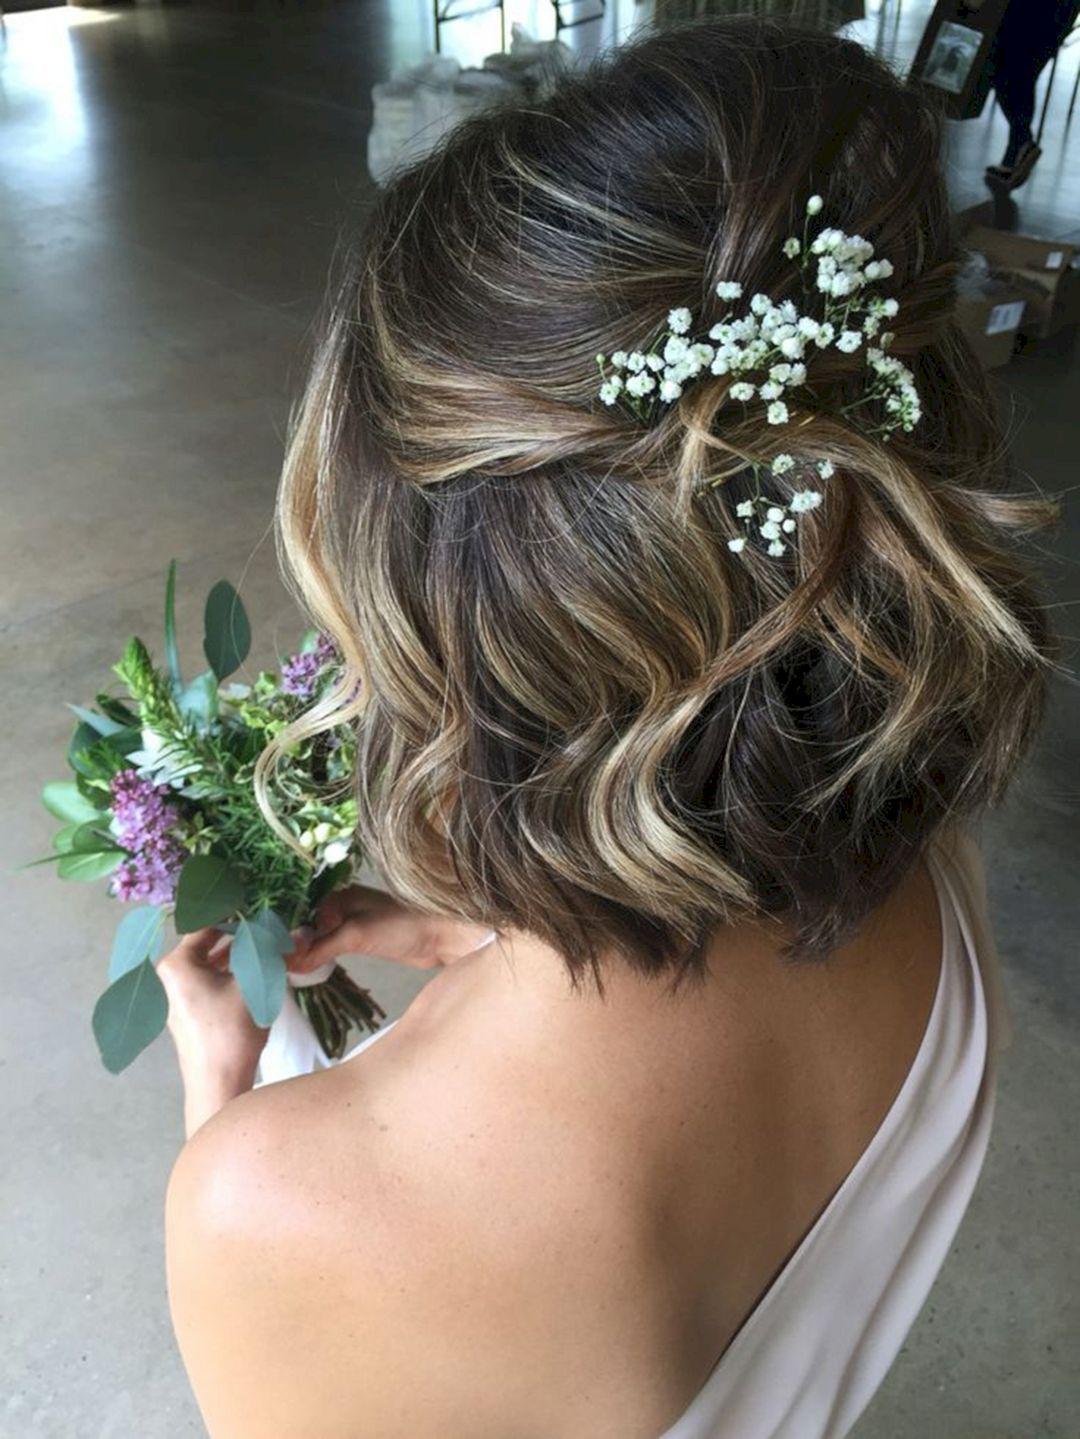 Sheath bodycon short lace dress frisuren pinterest wedding